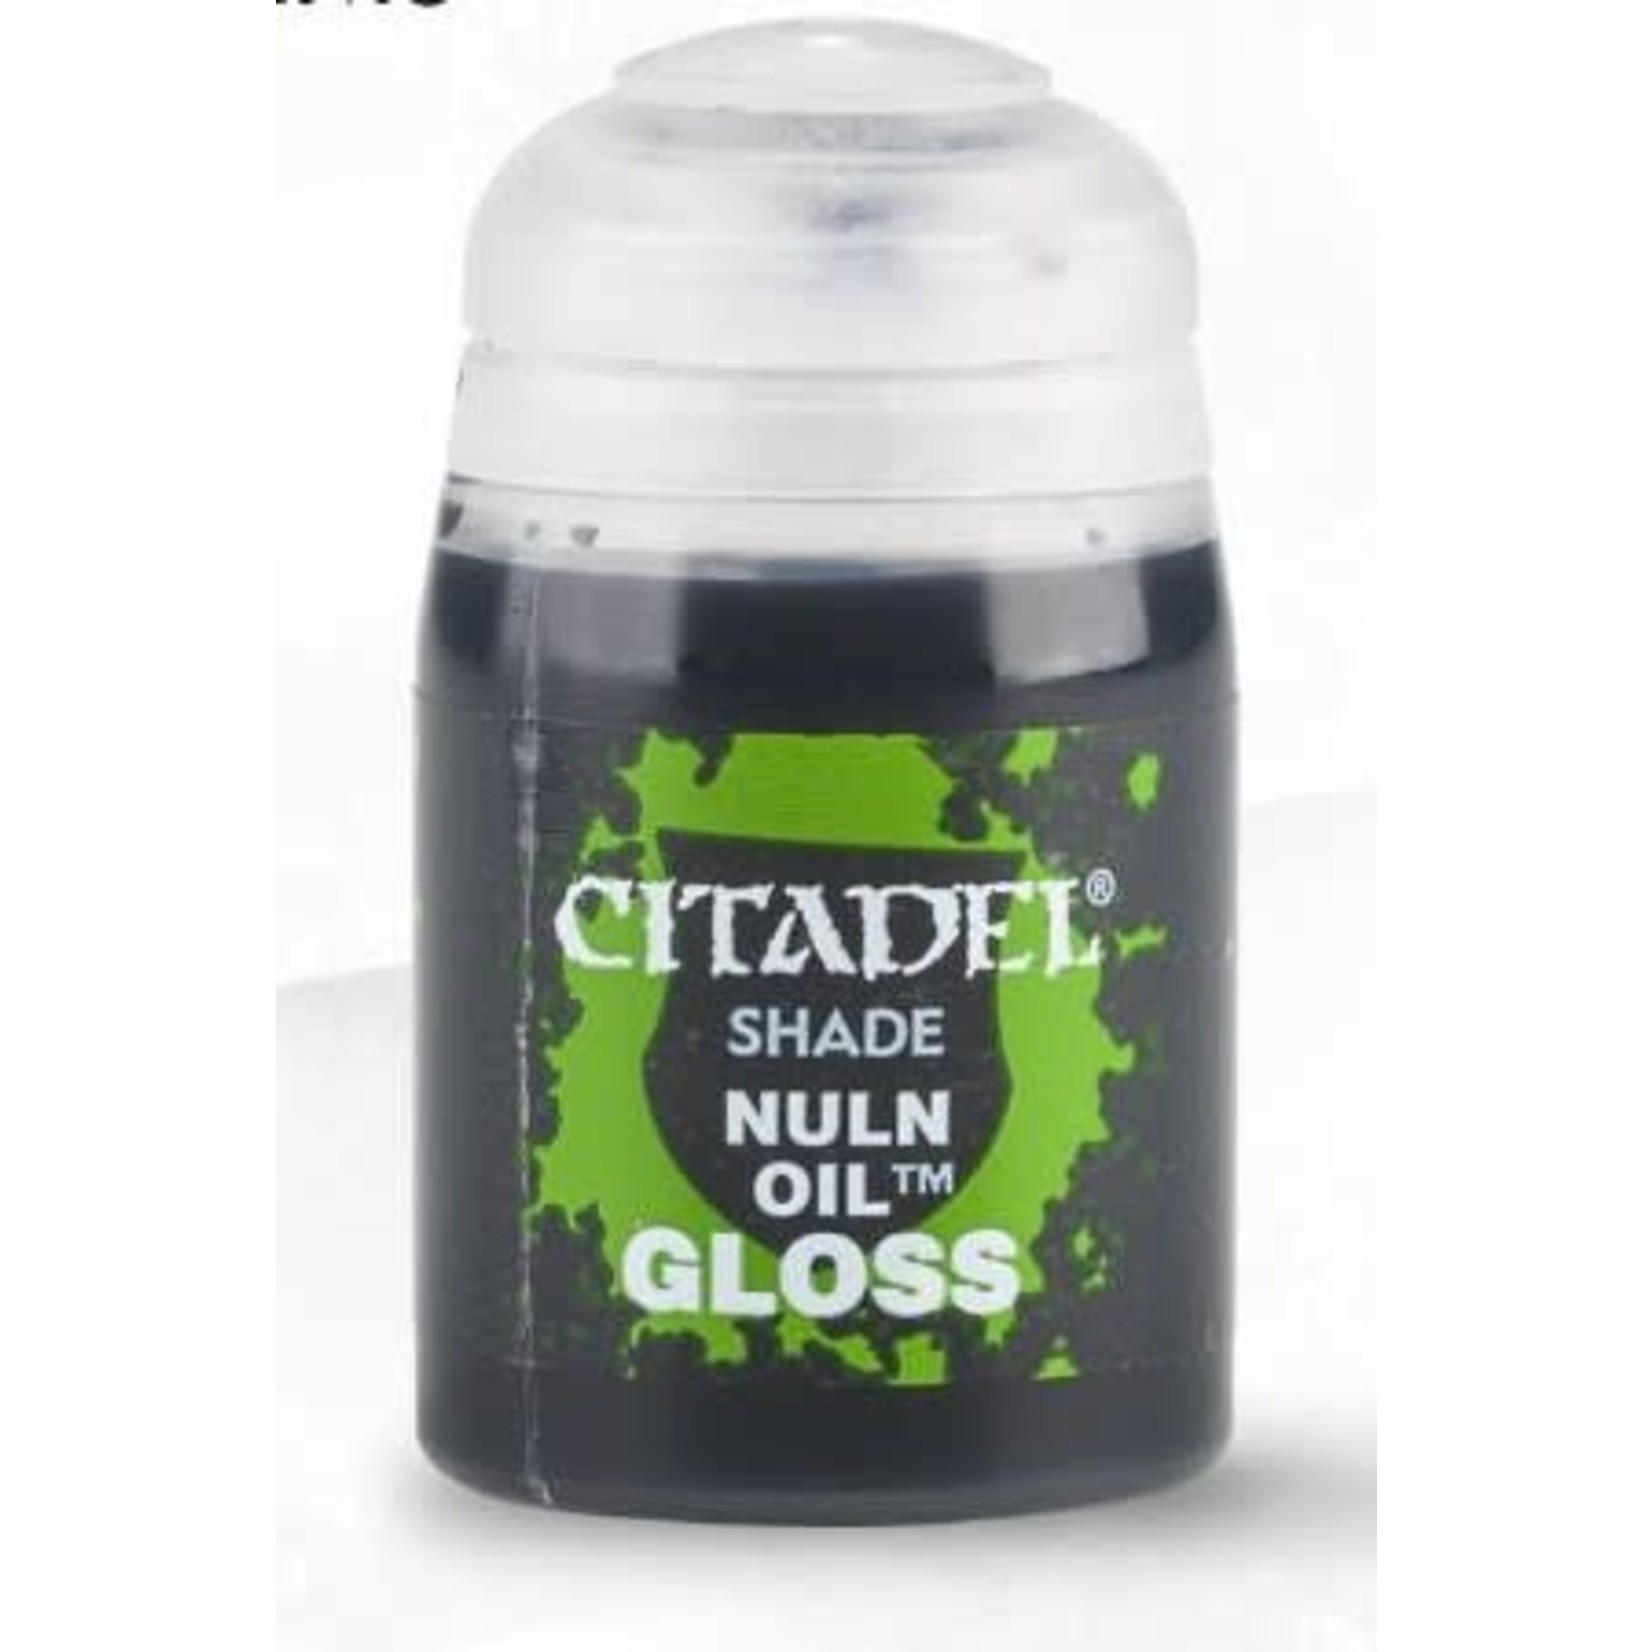 Games Workshop Citadel Paint: Nuln Oil 24ml Gloss